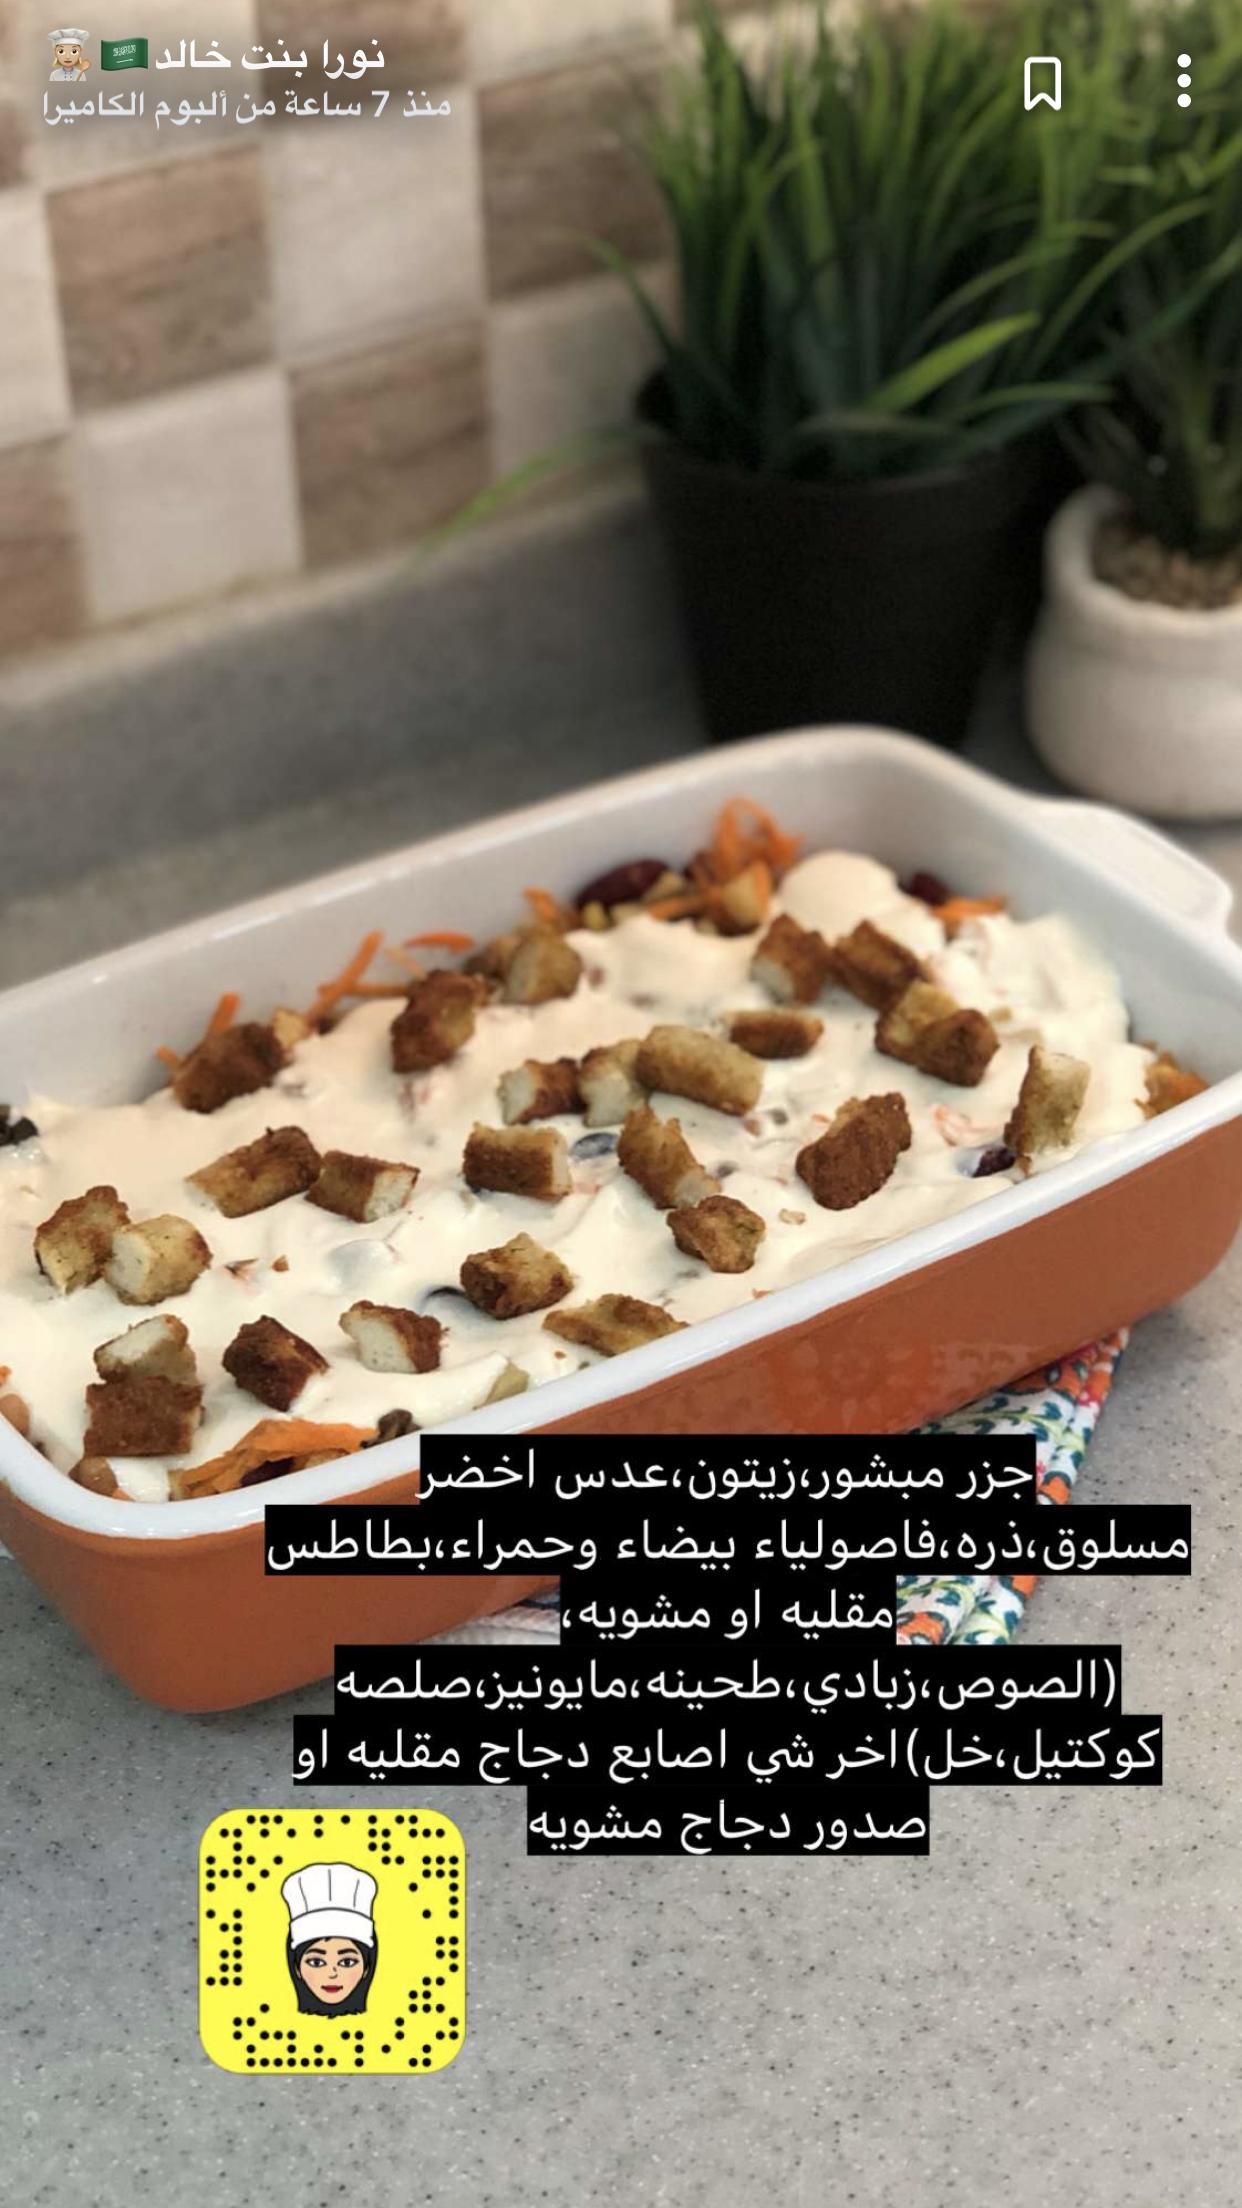 Pin By Barakh On سلطات Food And Drink Food Arabic Food